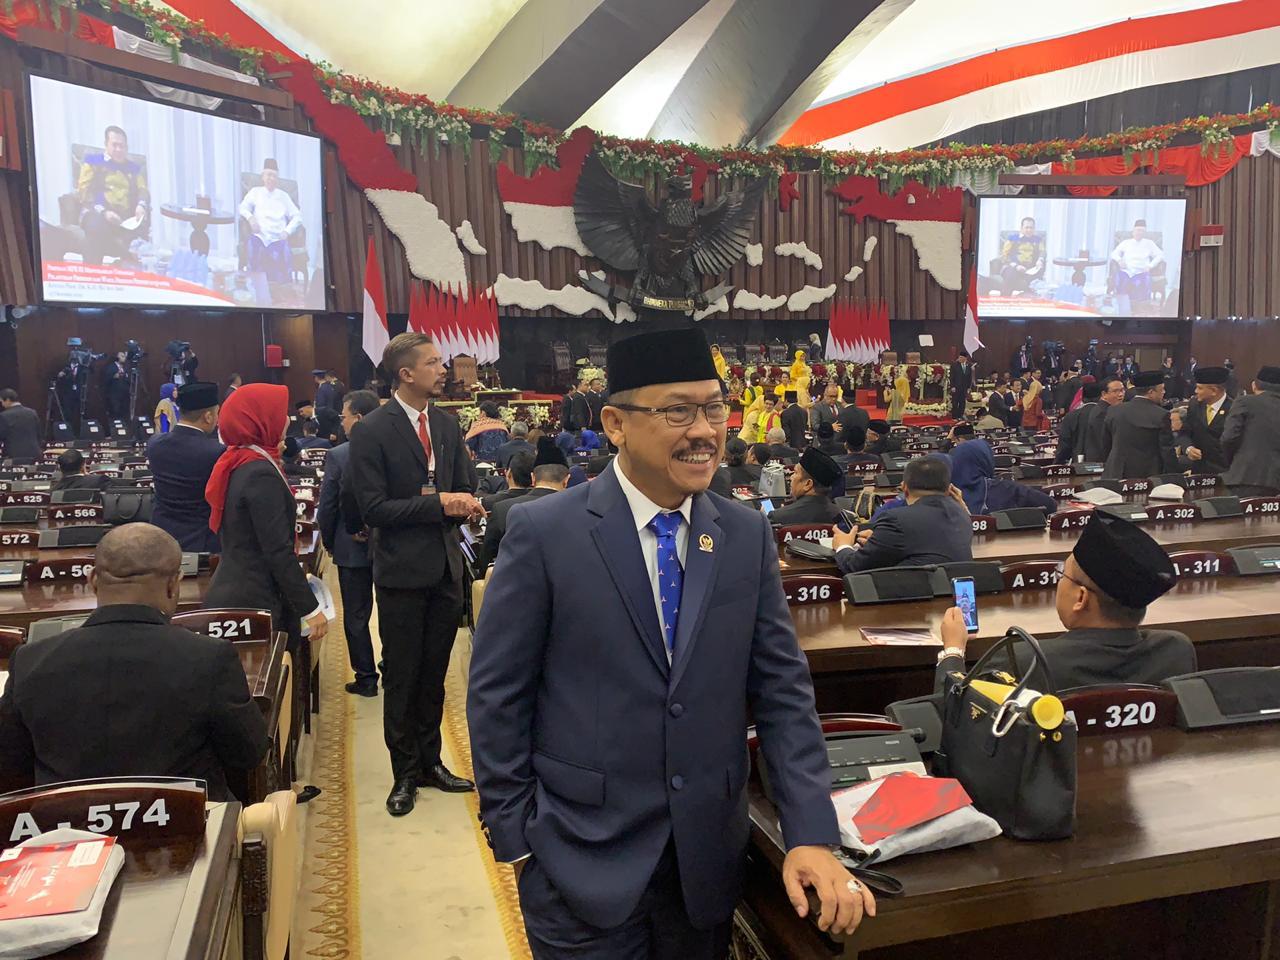 Fraksi Partai Demokrat Tolak Bahas RUU Omnibuslaw Cilaka